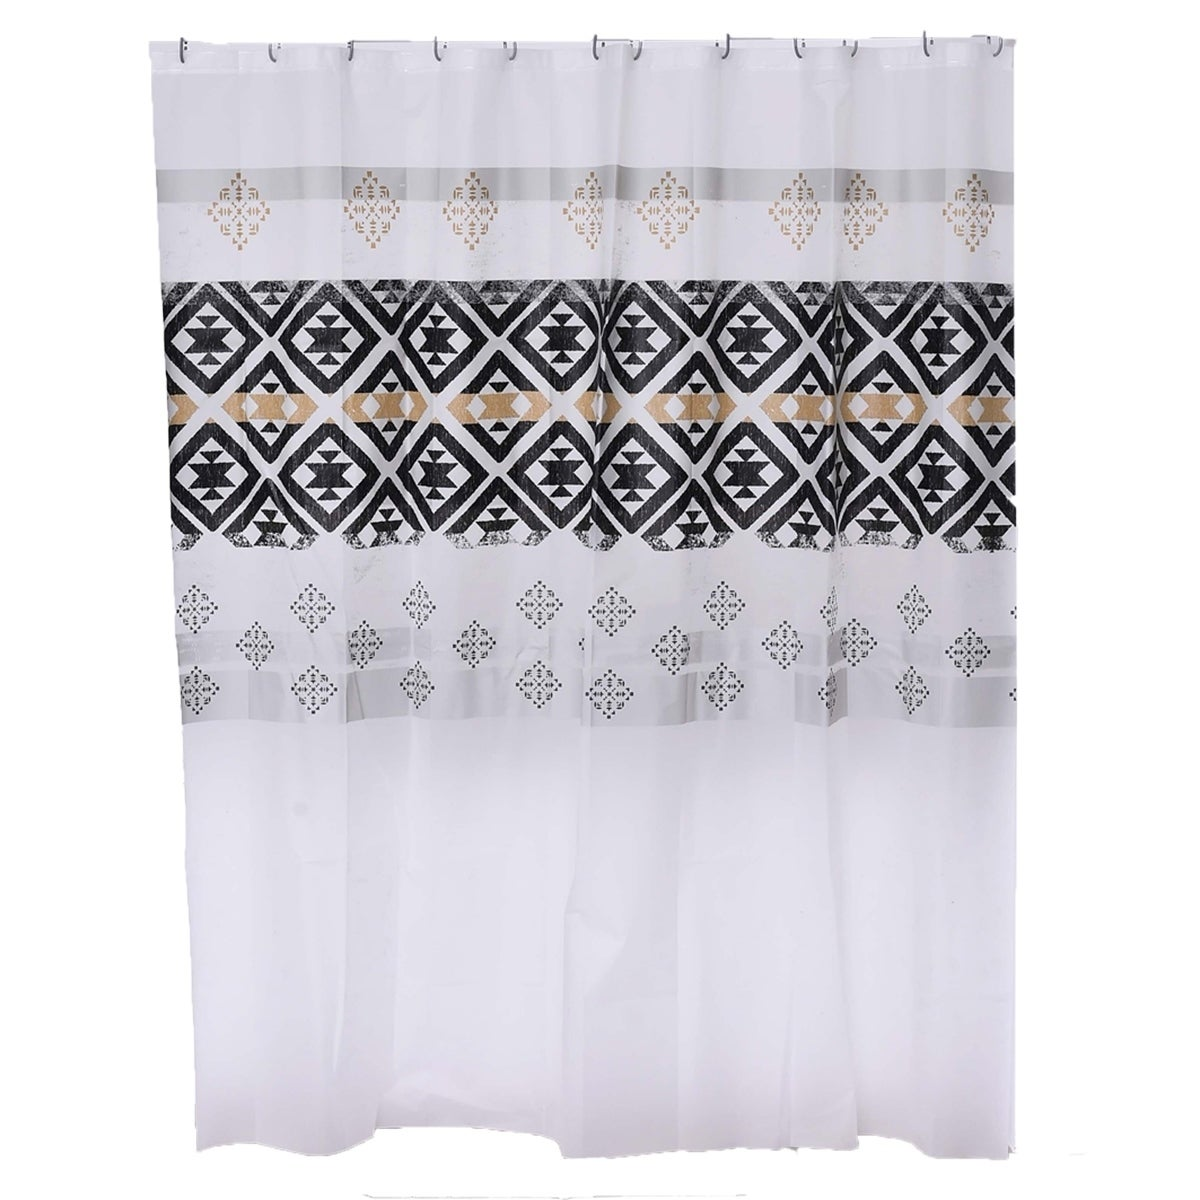 "Black//White Greek Key Seashell Pattern Polyester Fabric Shower Curtain 70/"" x 72/"""